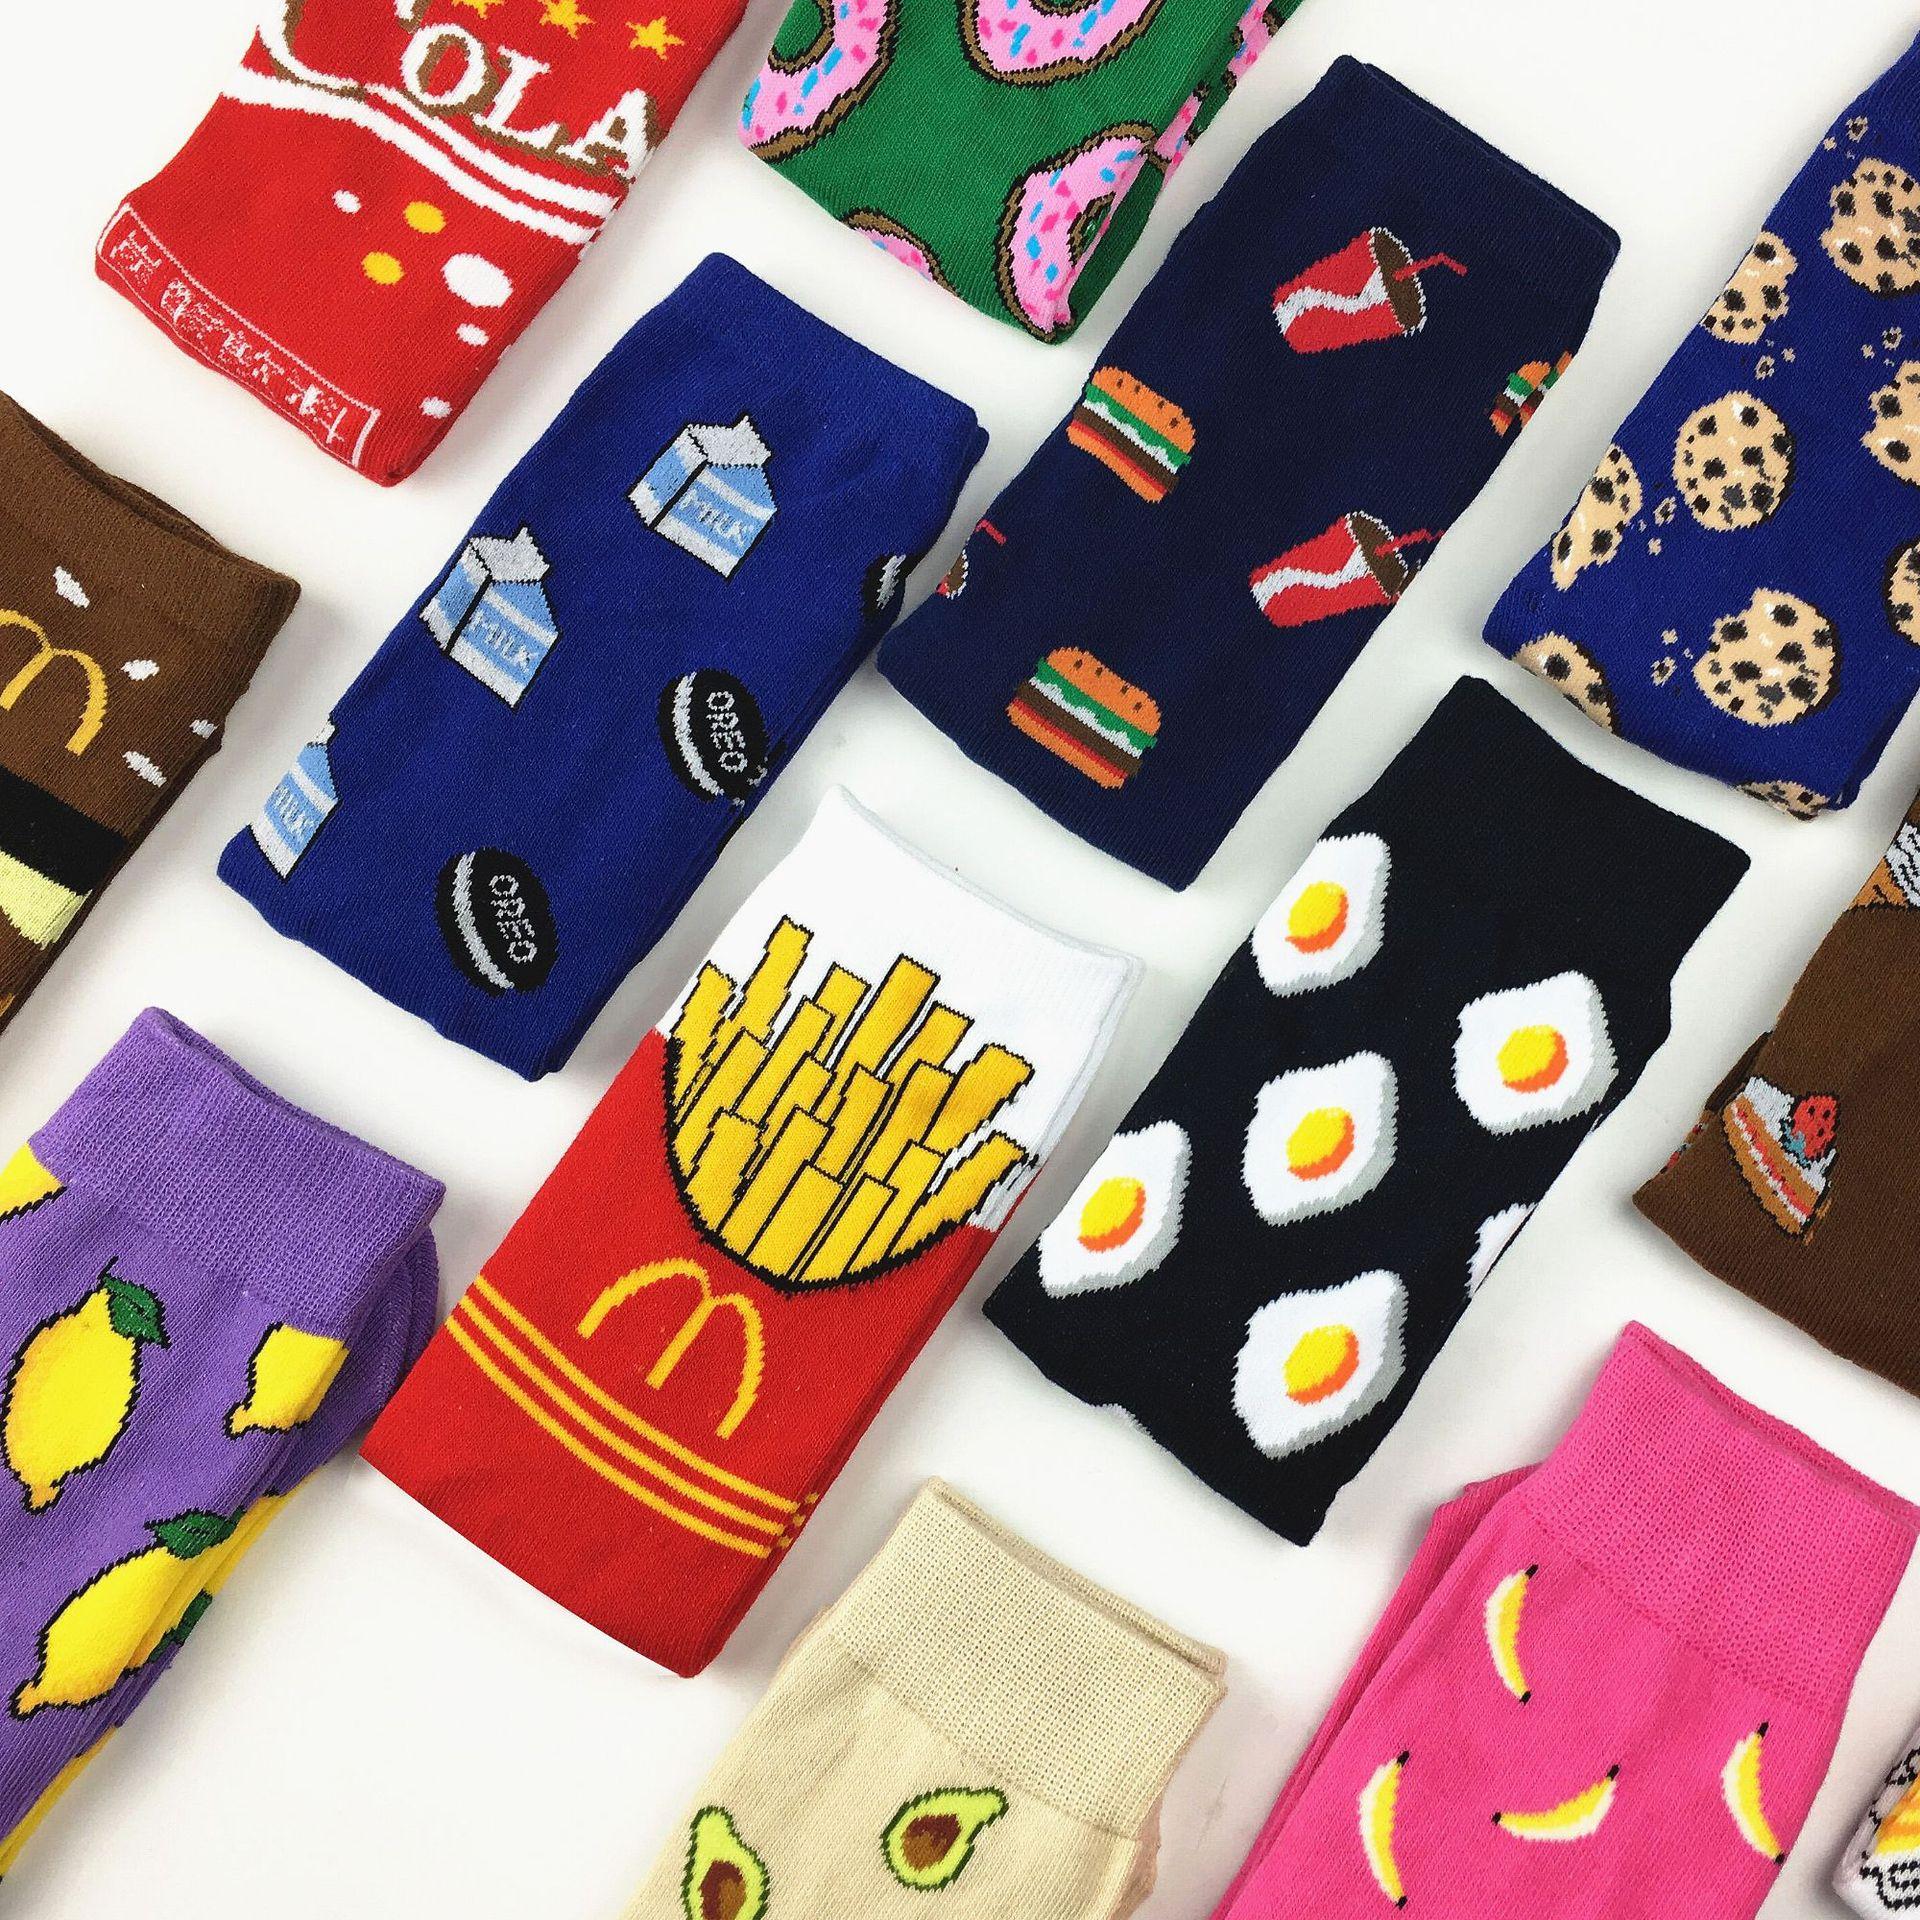 Women Men Socks Hot Fashion Middle Tube Socks Lemon Milk Ice-cream Biscuits Warmth Socks Multicolor Cute Socks All Cotton